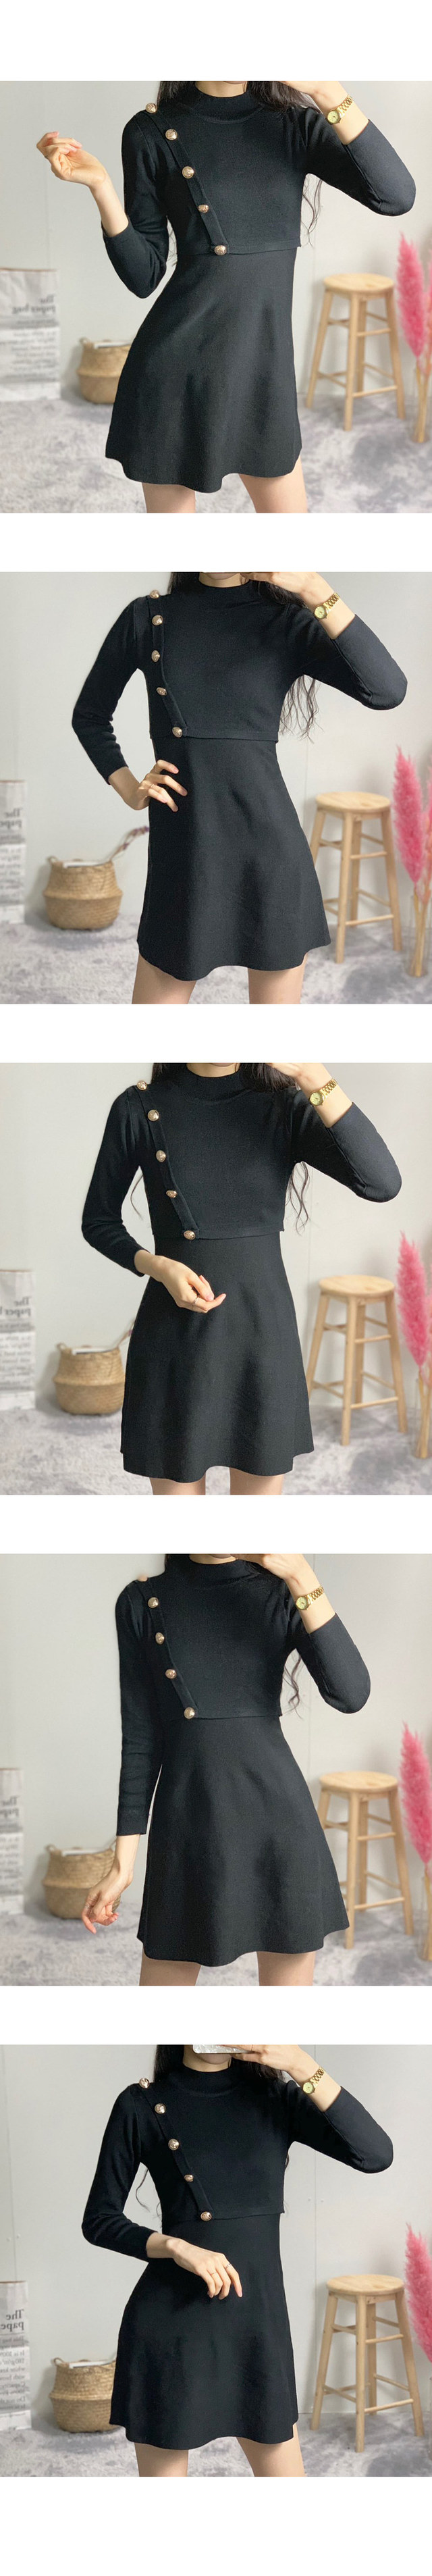 Sharon gold flare mini dress